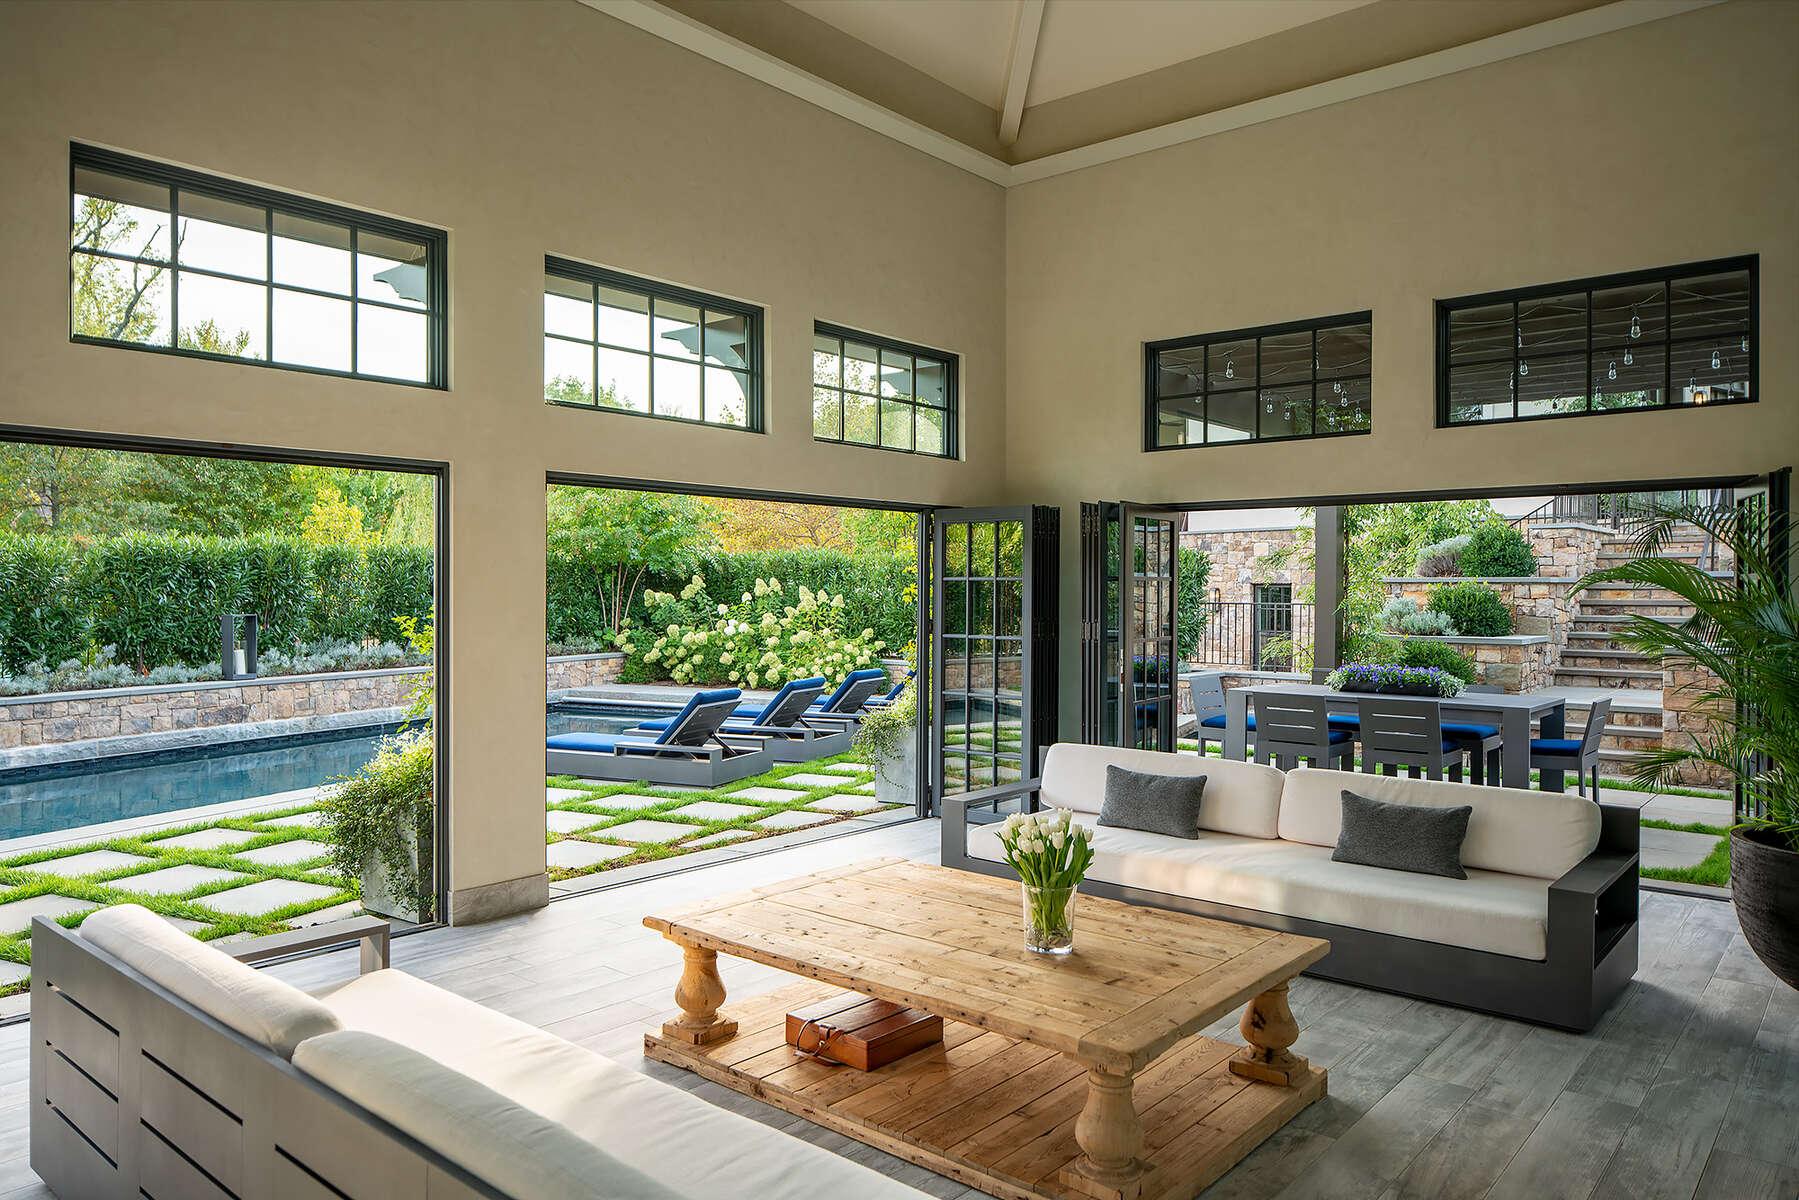 Ed Weber ArchitectsGlasser Residence,Pool & Guest HousesWashington, DC